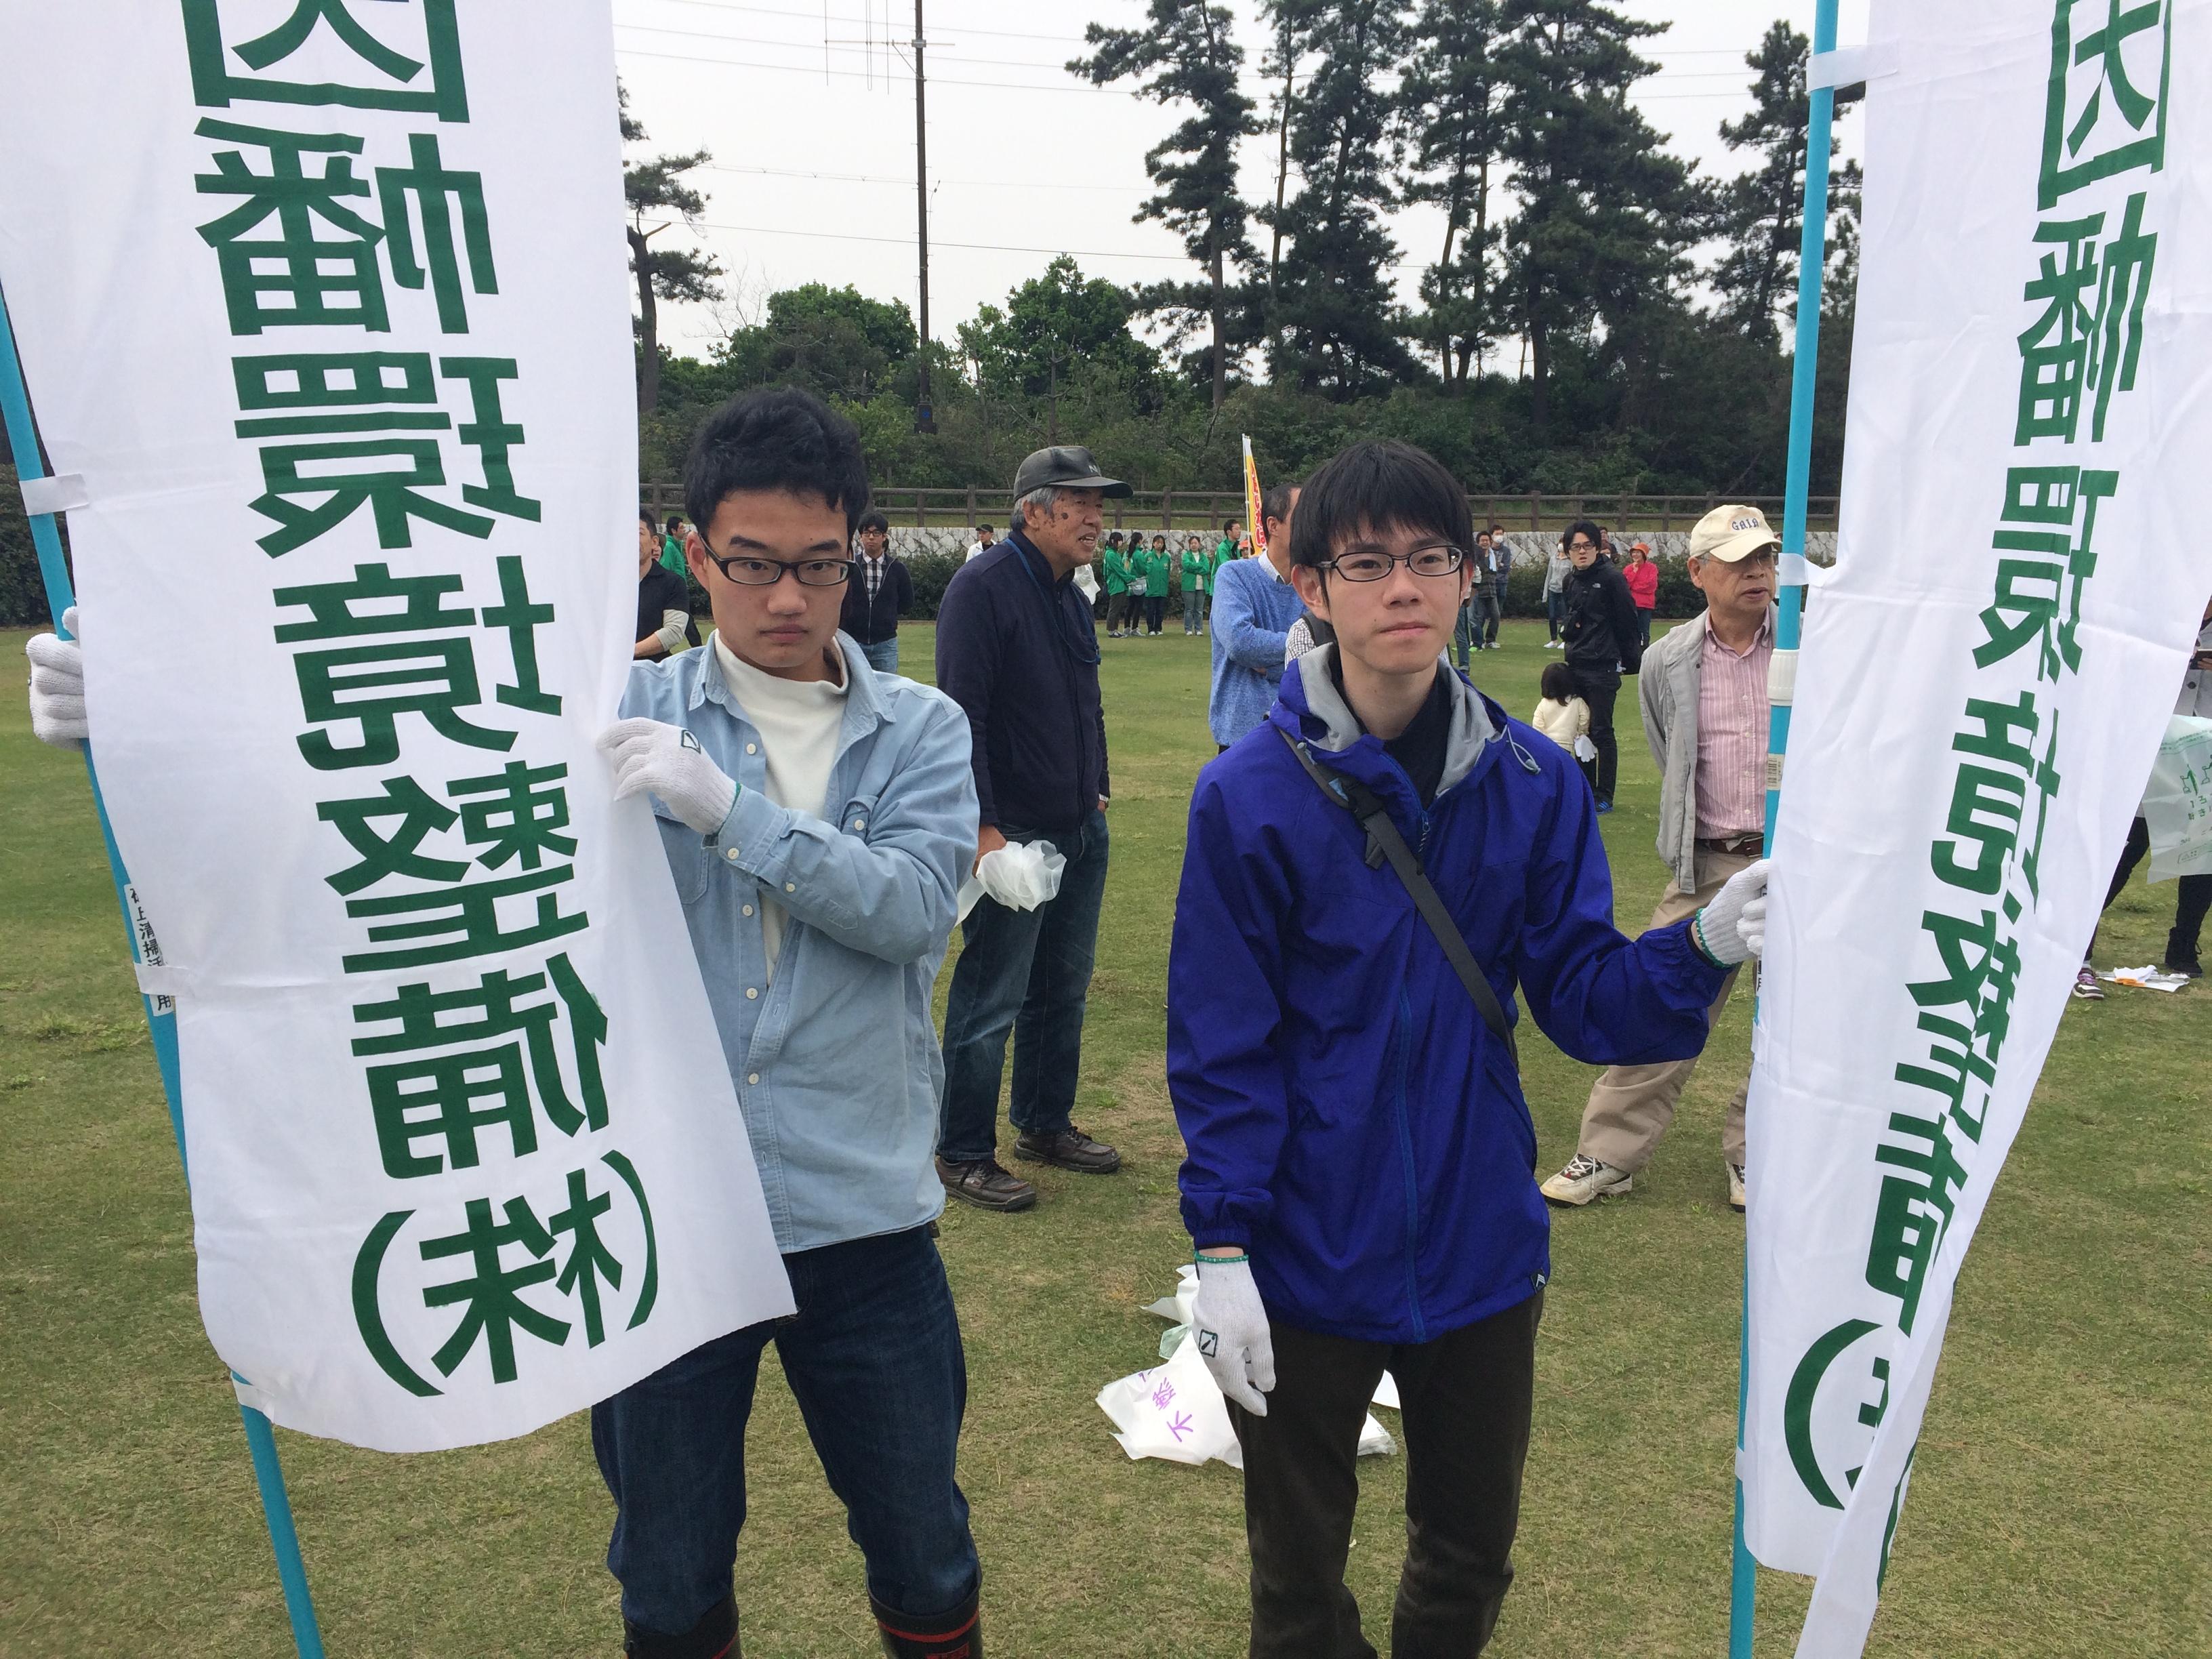 http://www.inaba-kankyo.co.jp/news/photo/IMG_0317.JPG